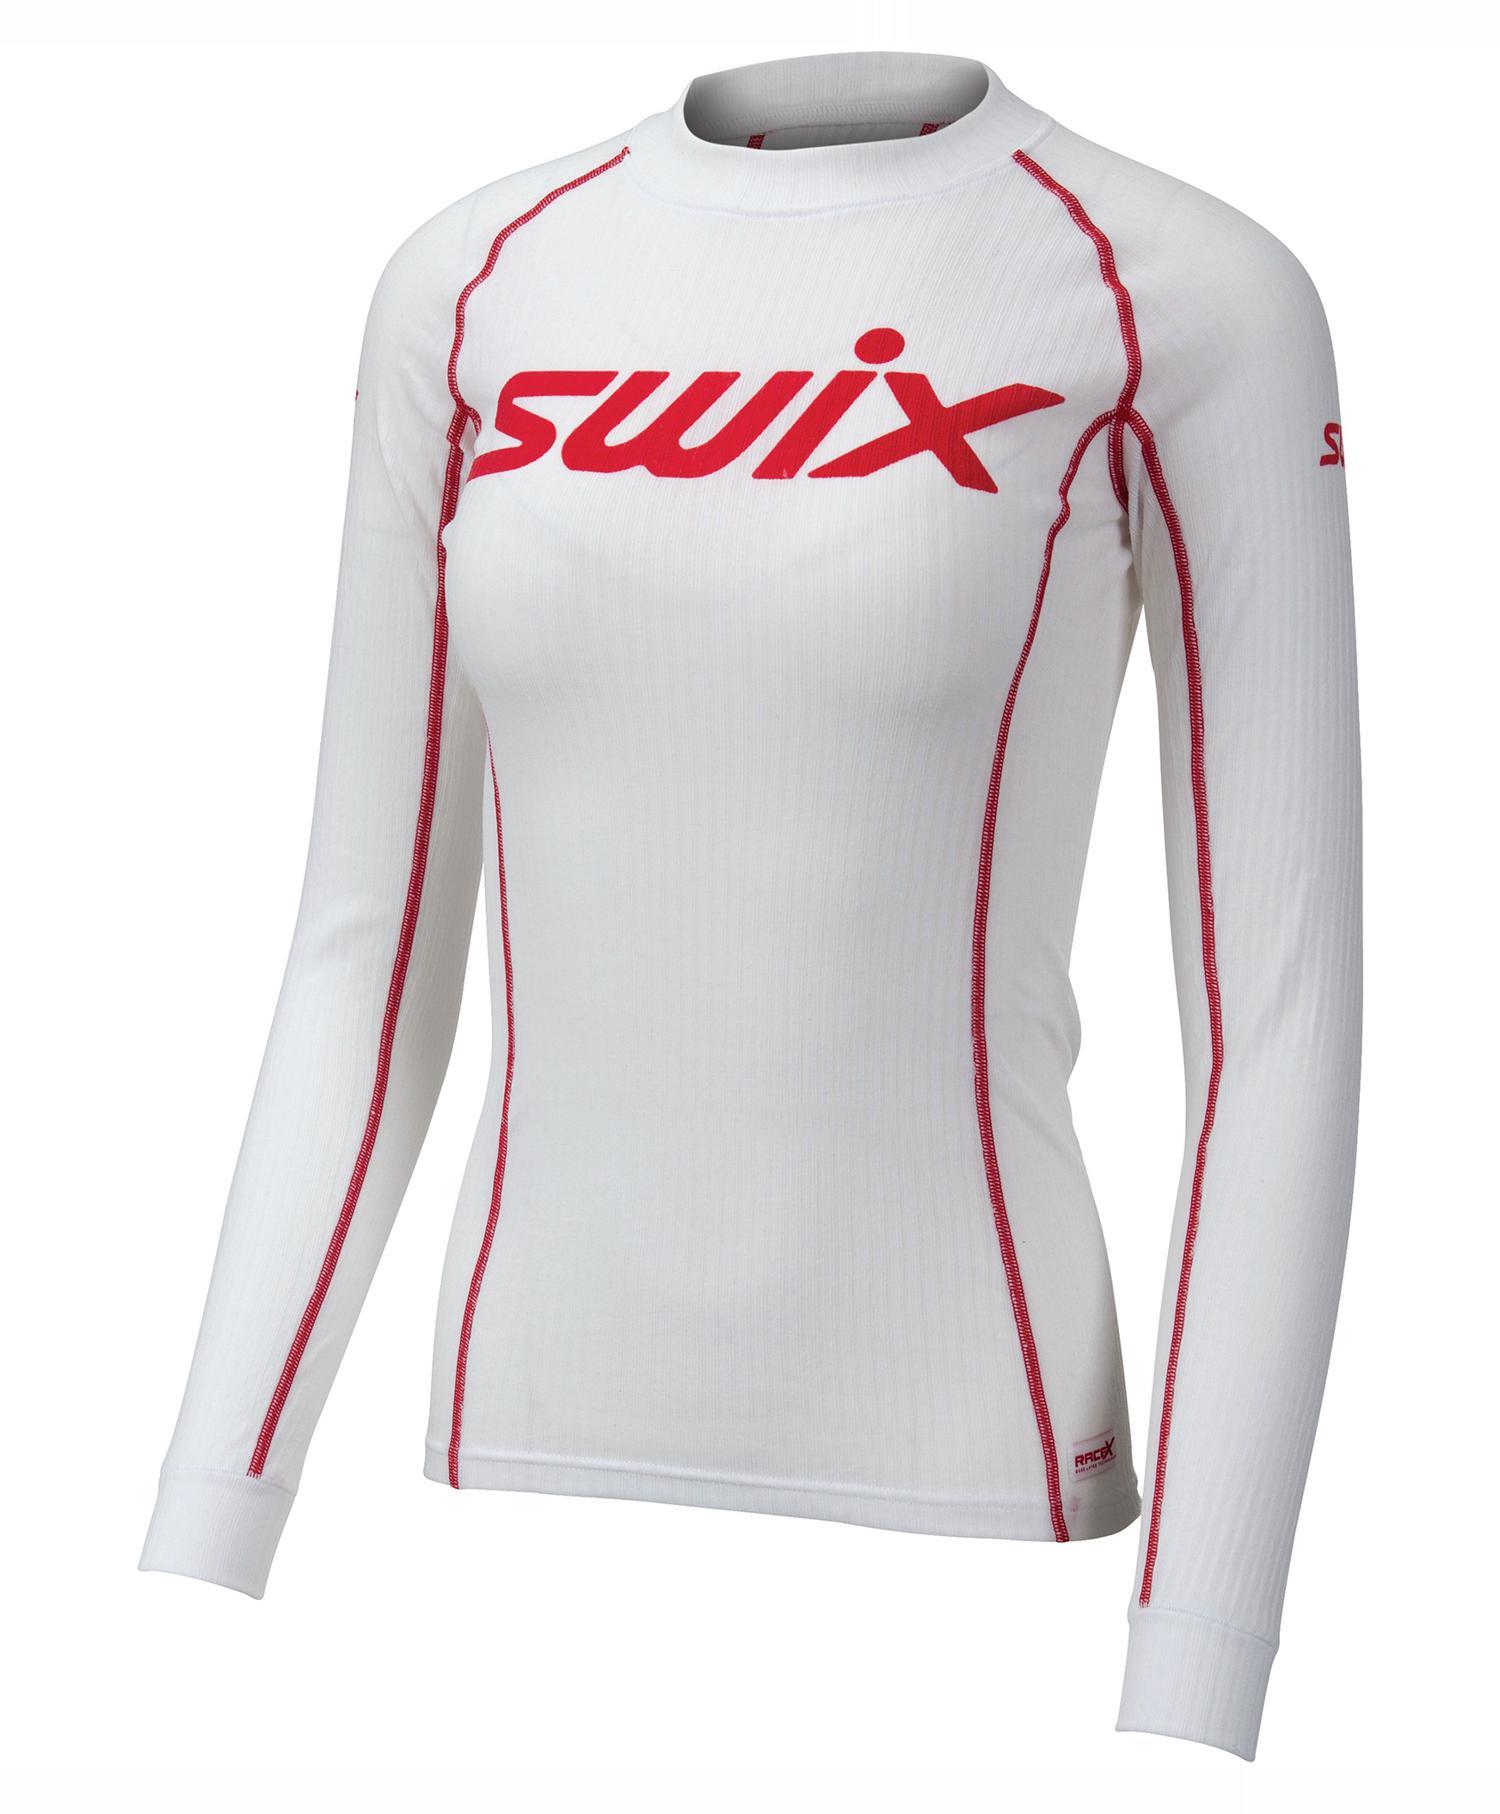 Swix RaceX Long Sleeves